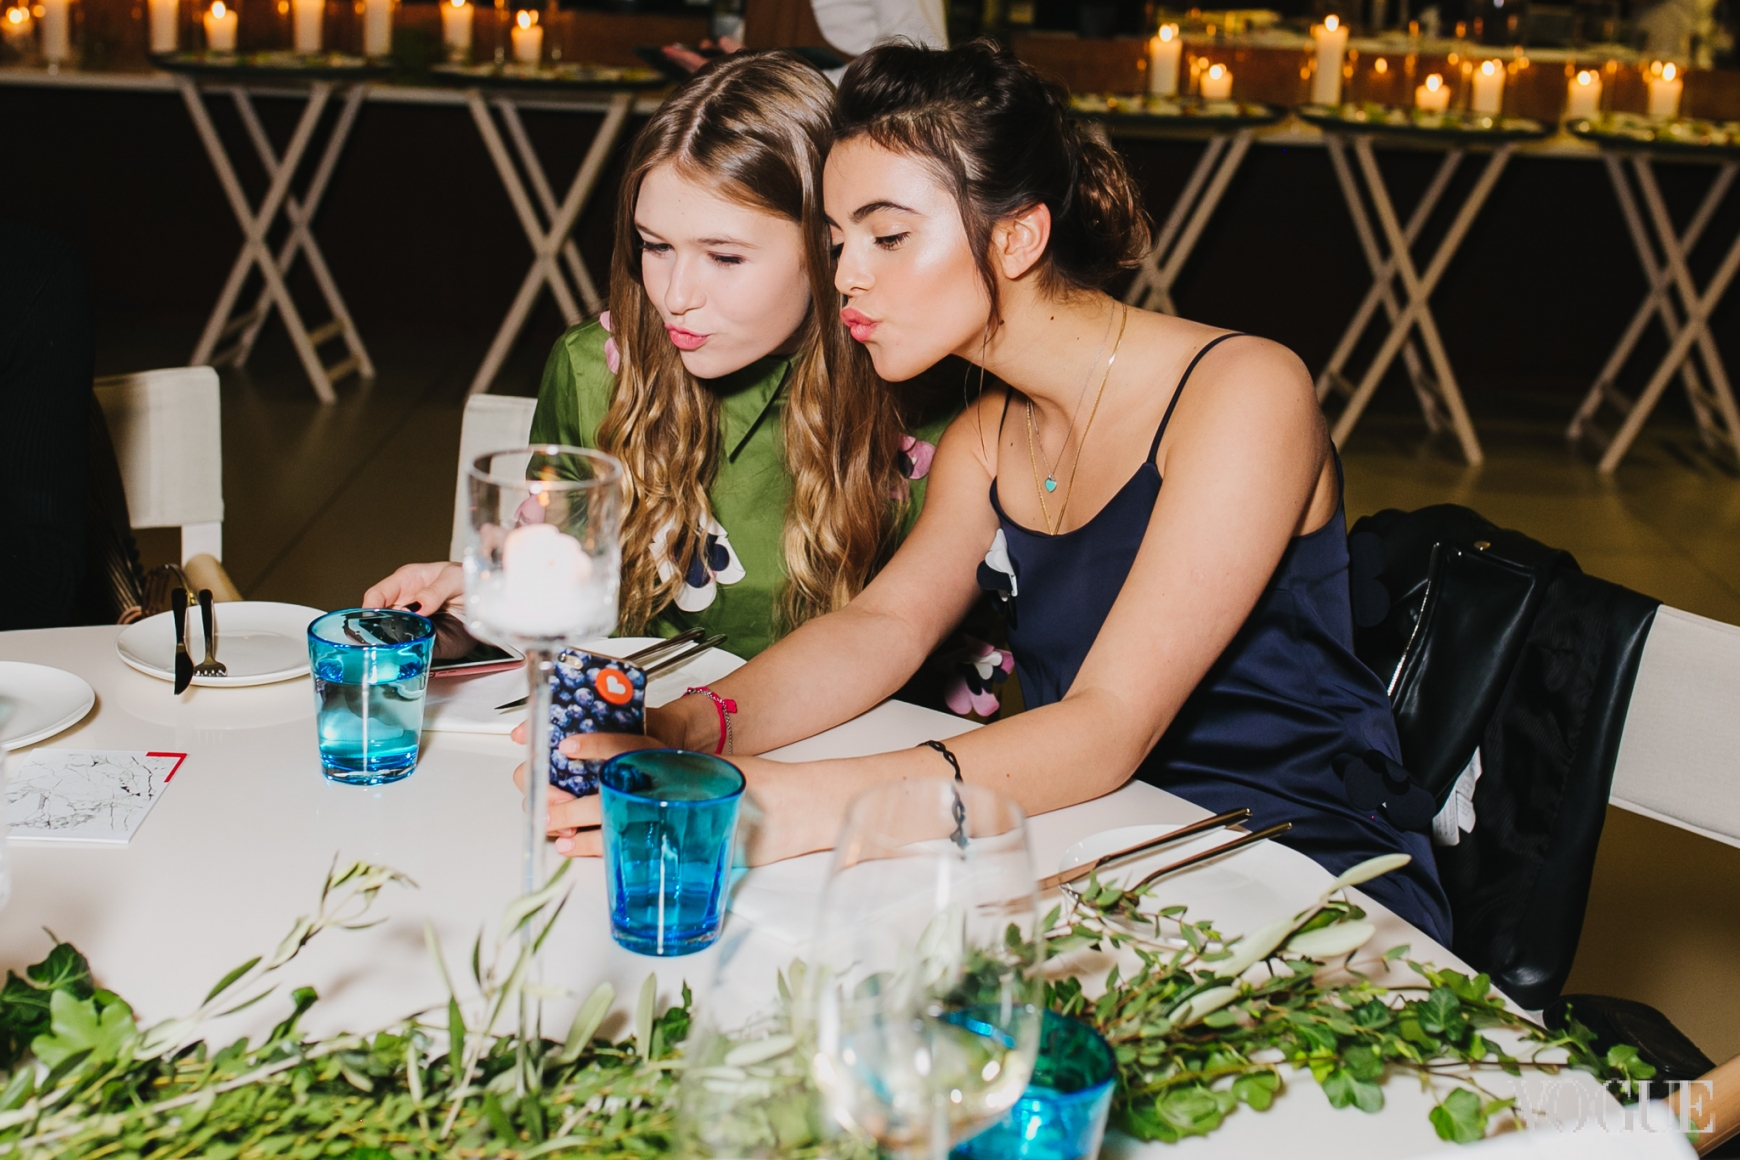 Соня Киперман и Елизавета Арфуш